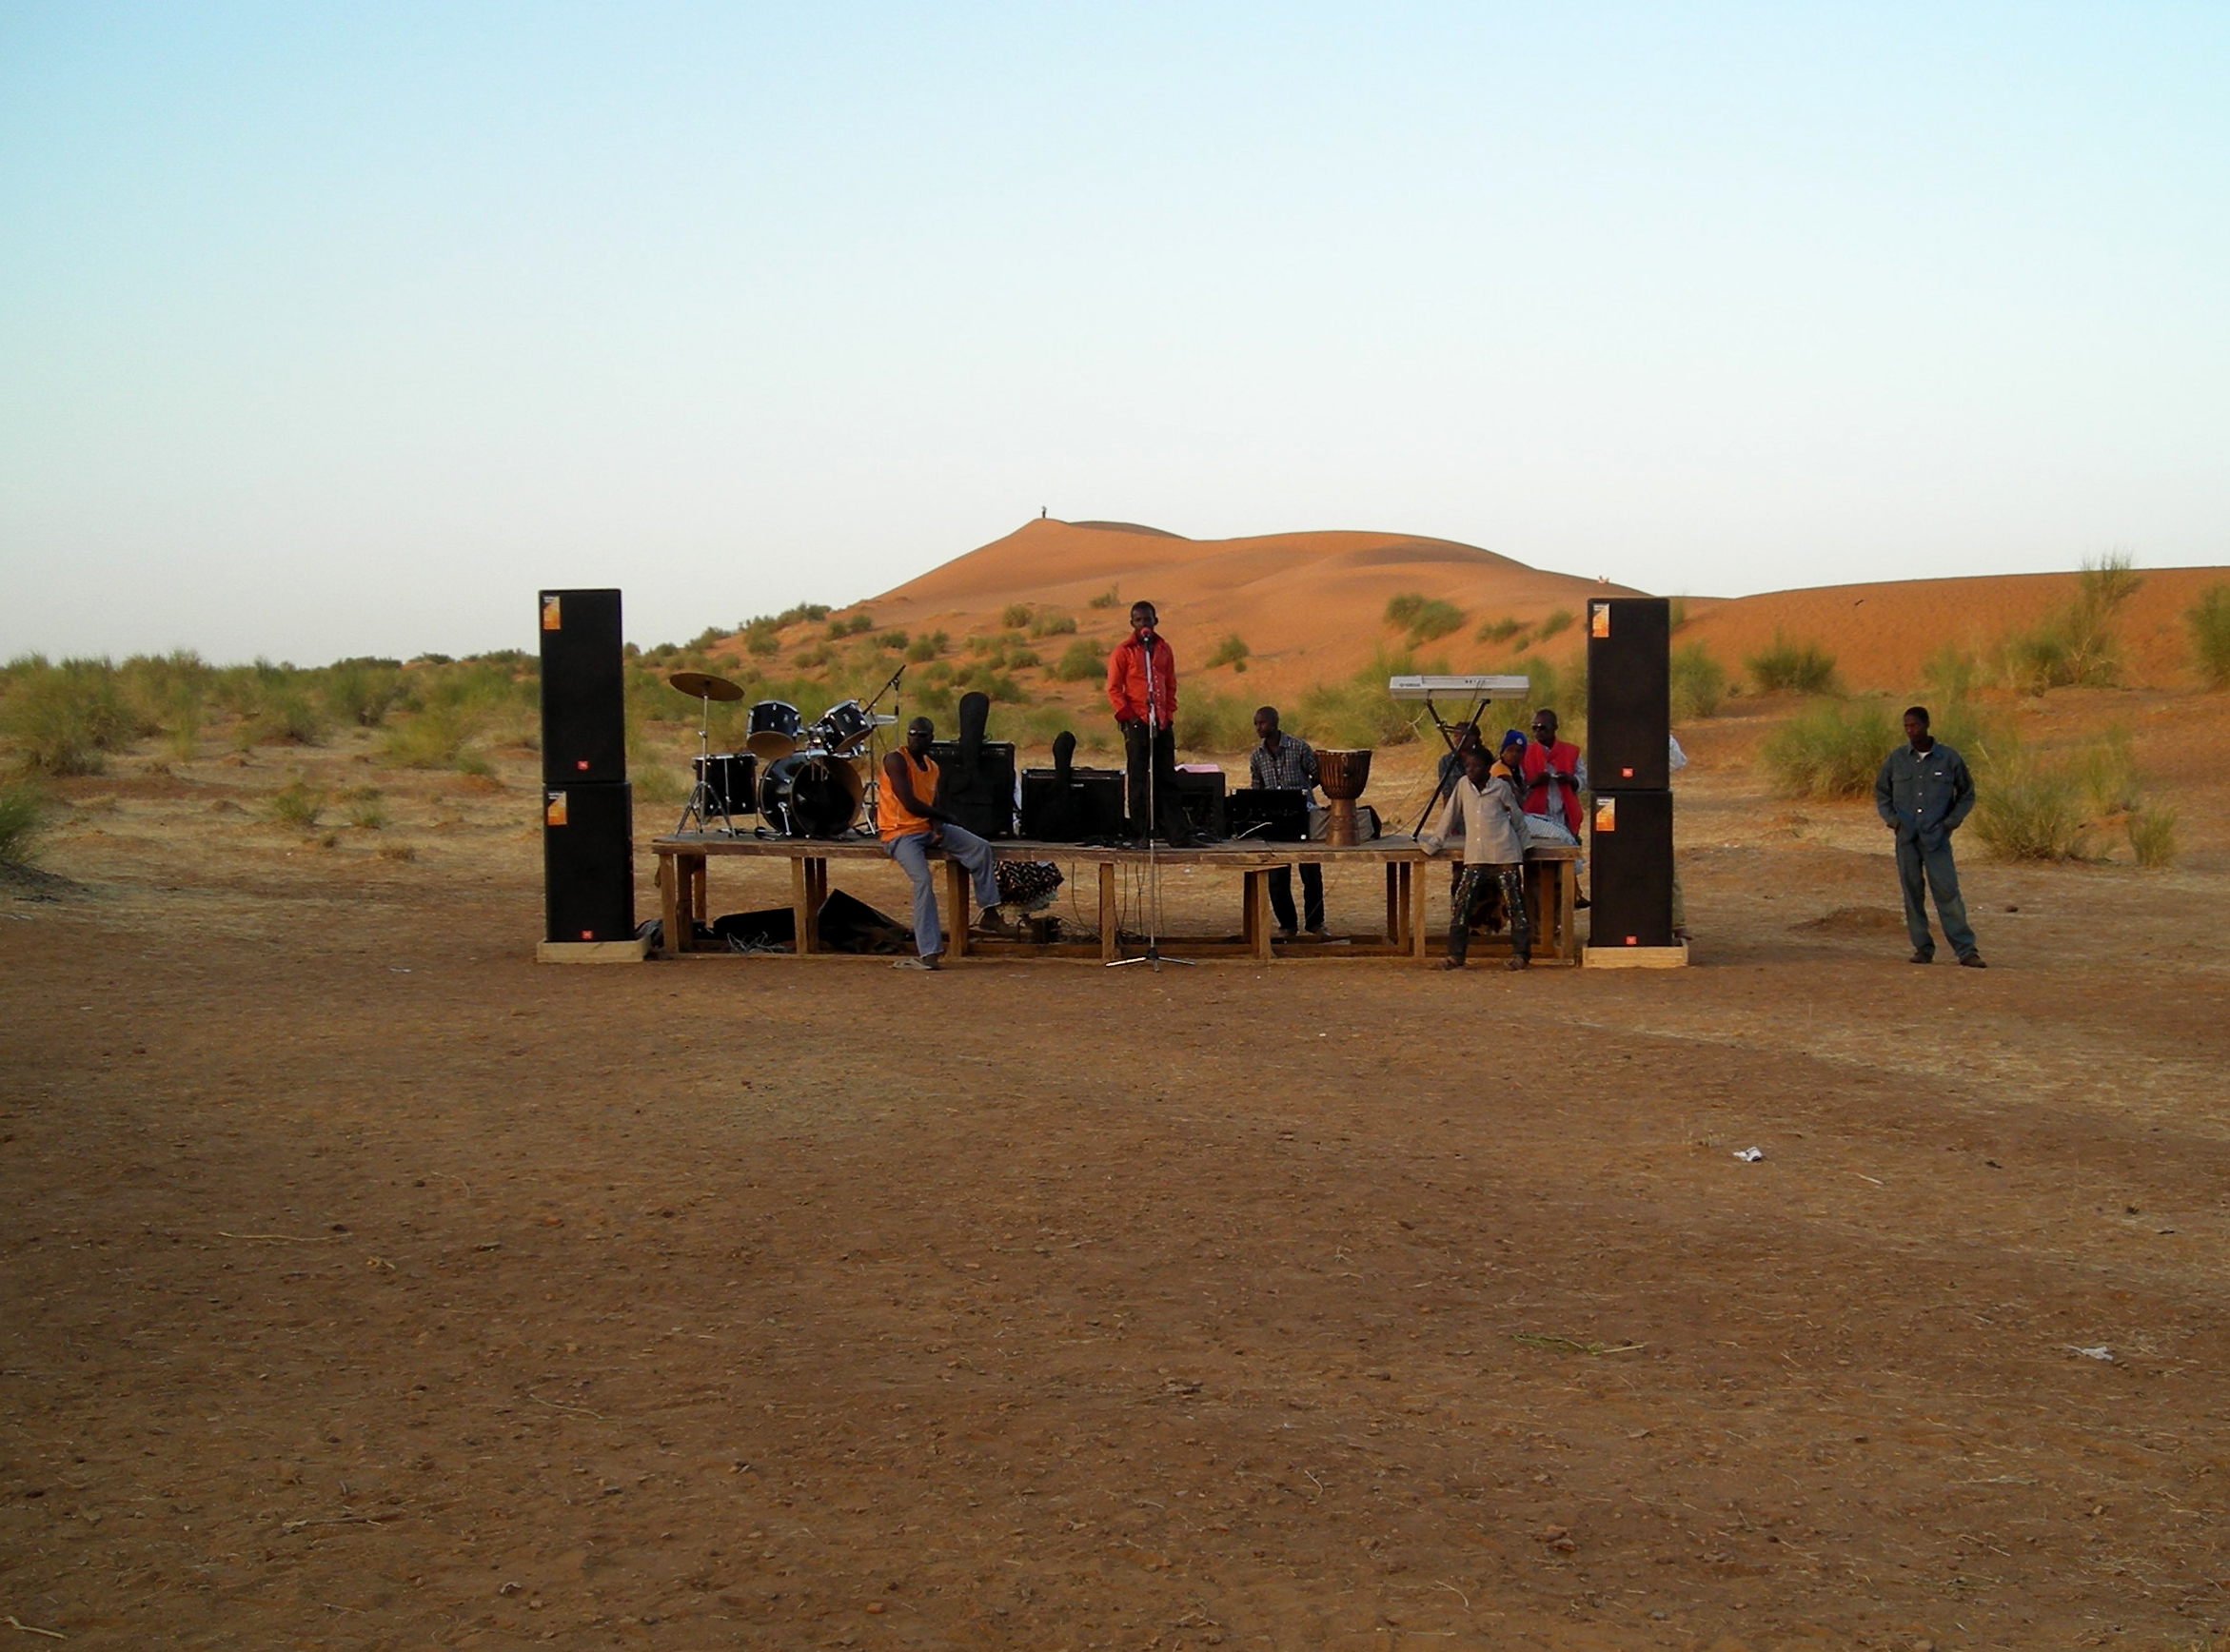 Nasser Maïga making a first soundcheck at the Sweden/Mali voices festival in Koïma, jan 2010. The red dunesof Koïma in the background.